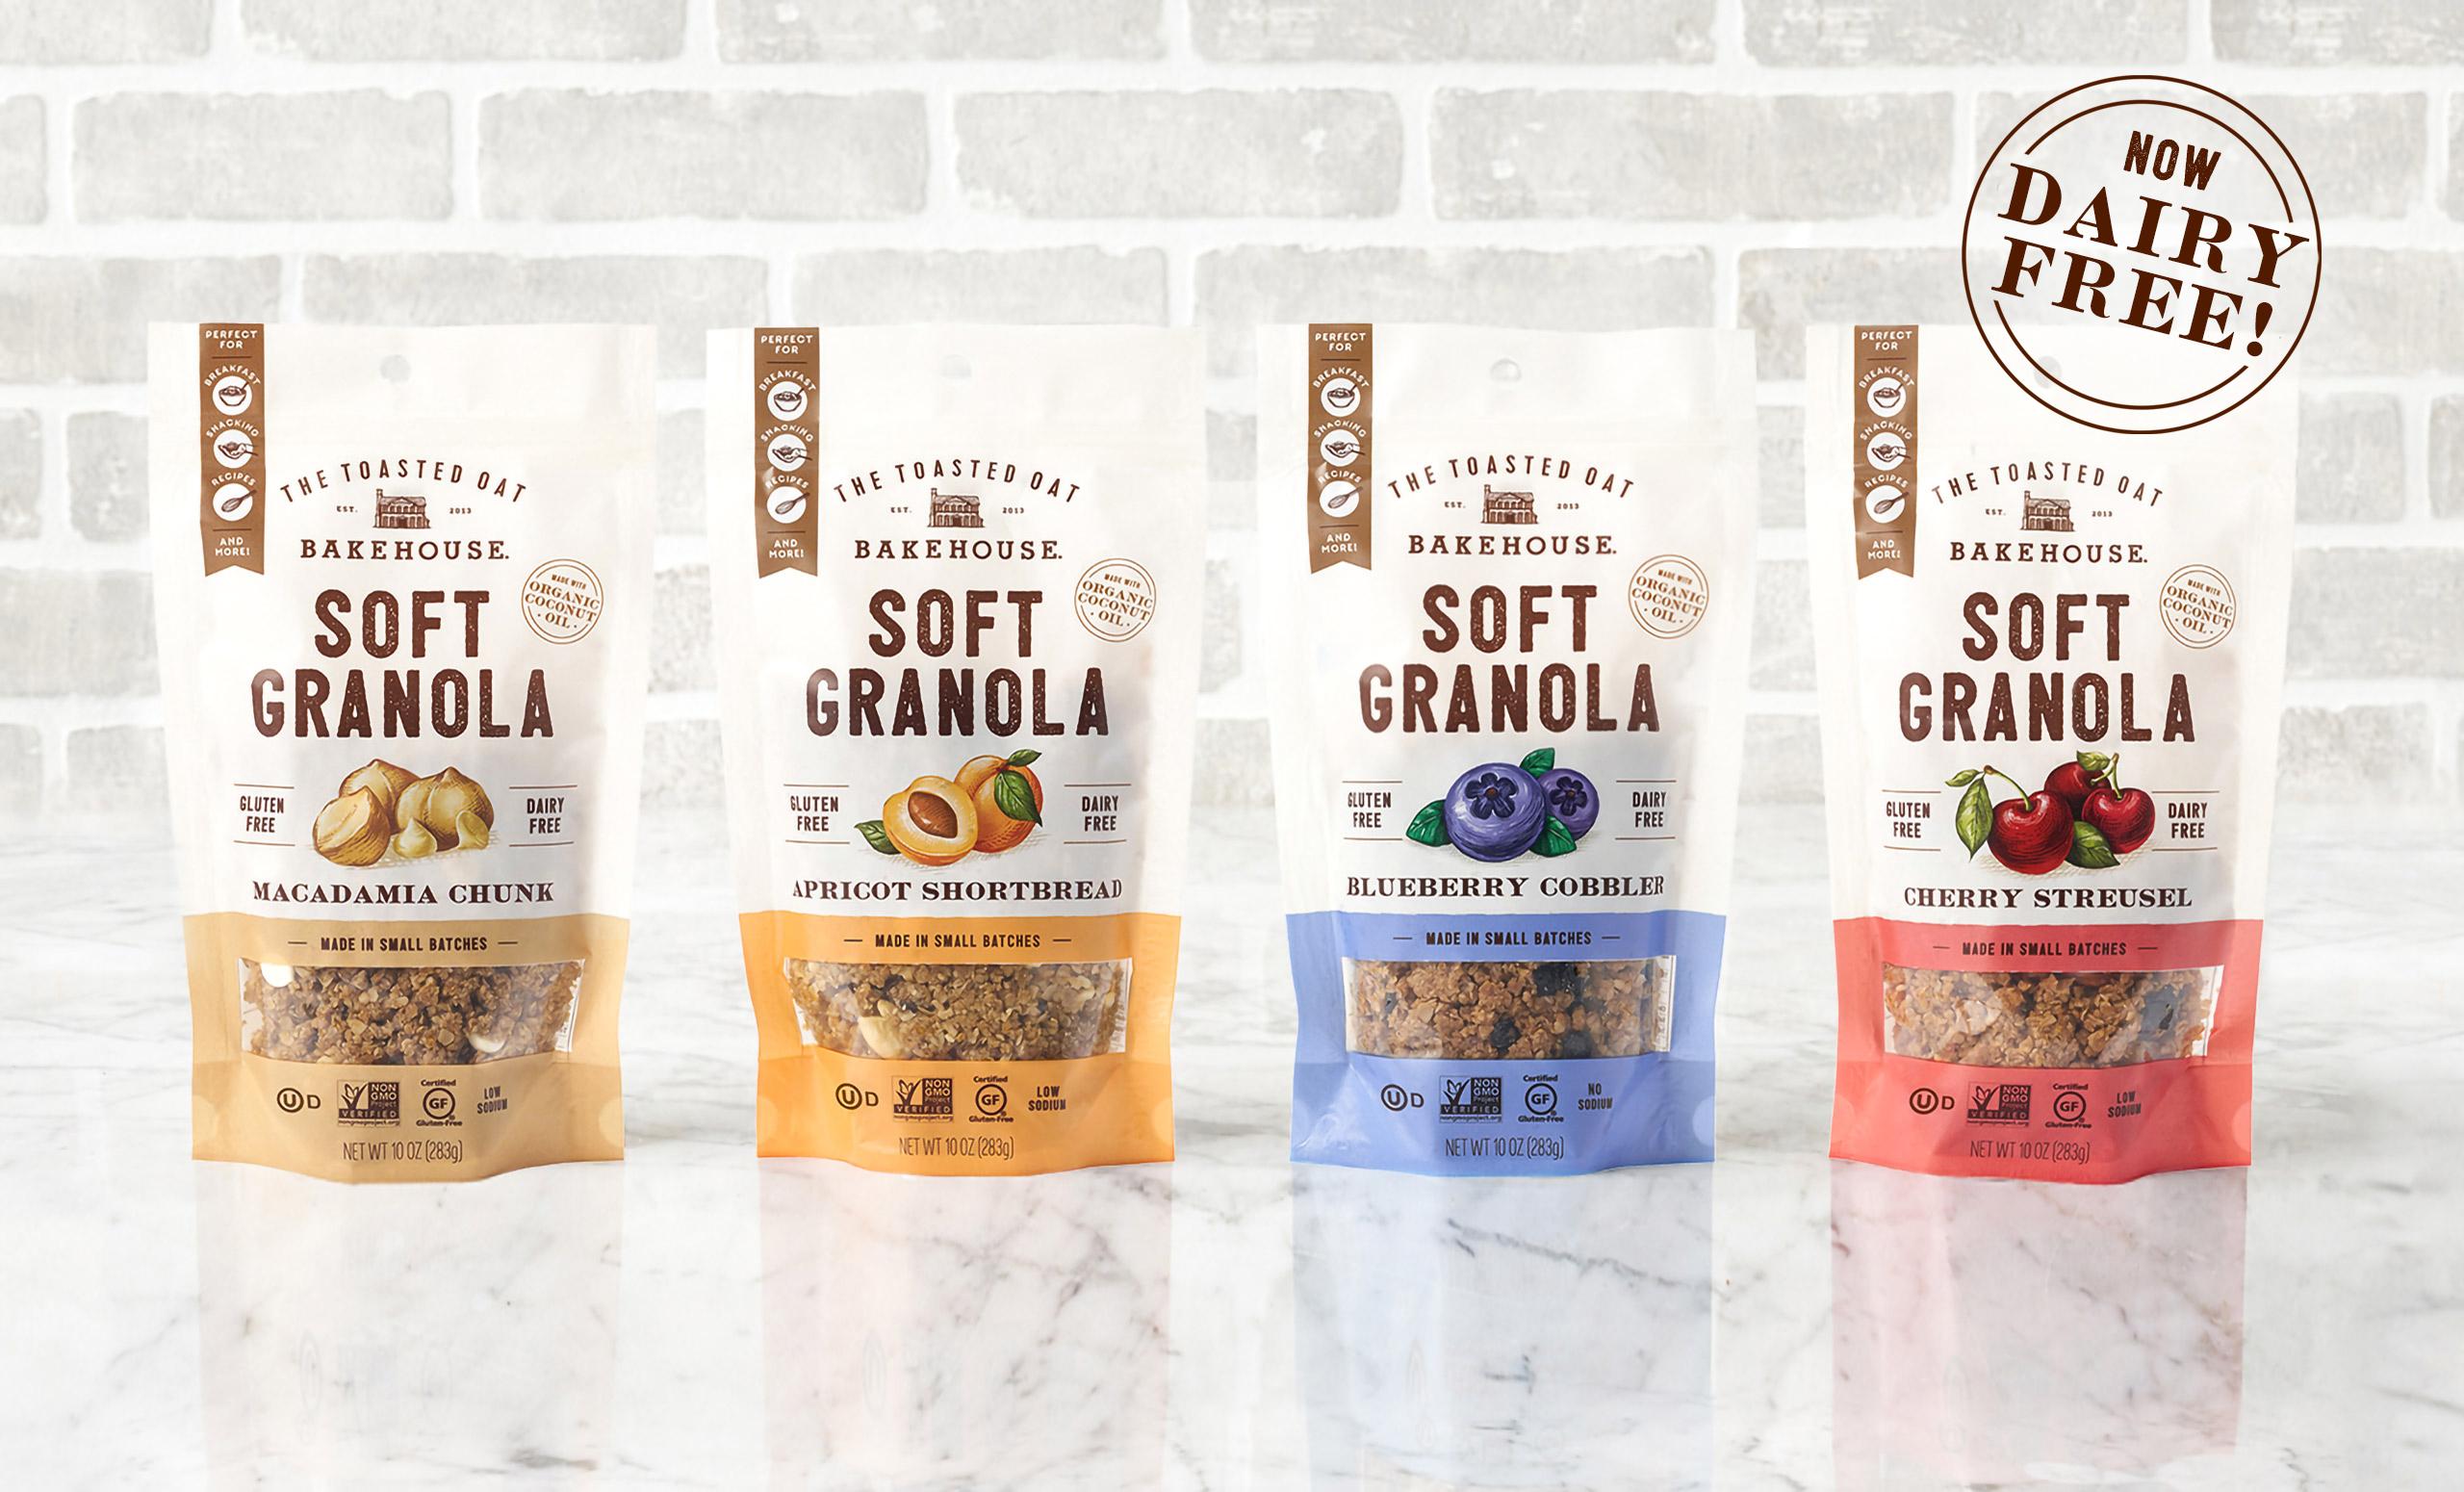 The Toasted Oat Bakehouse Soft Granola